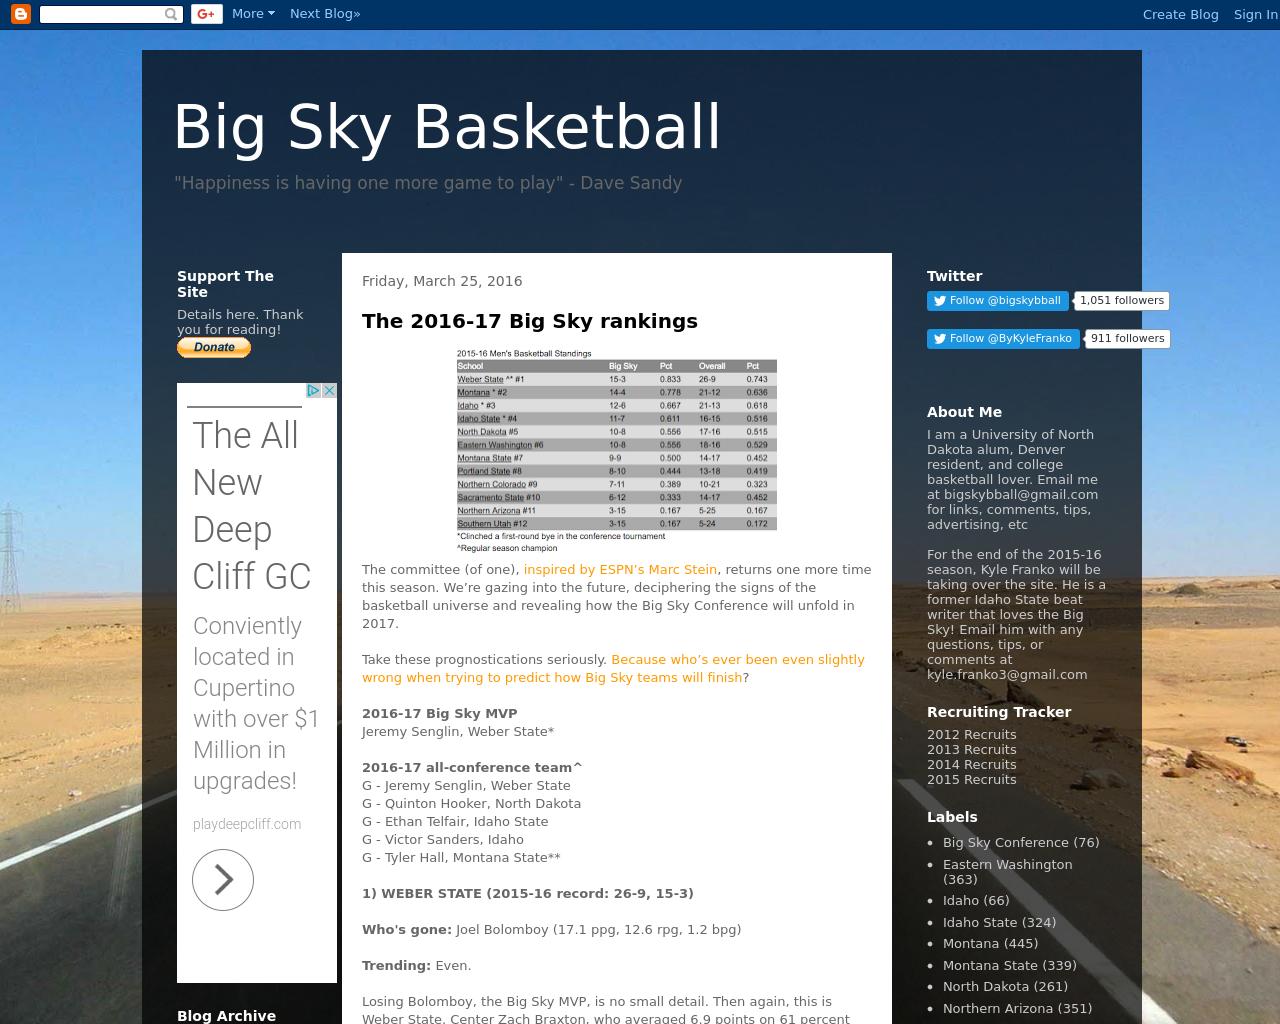 Big-Sky-Basketball-Advertising-Reviews-Pricing